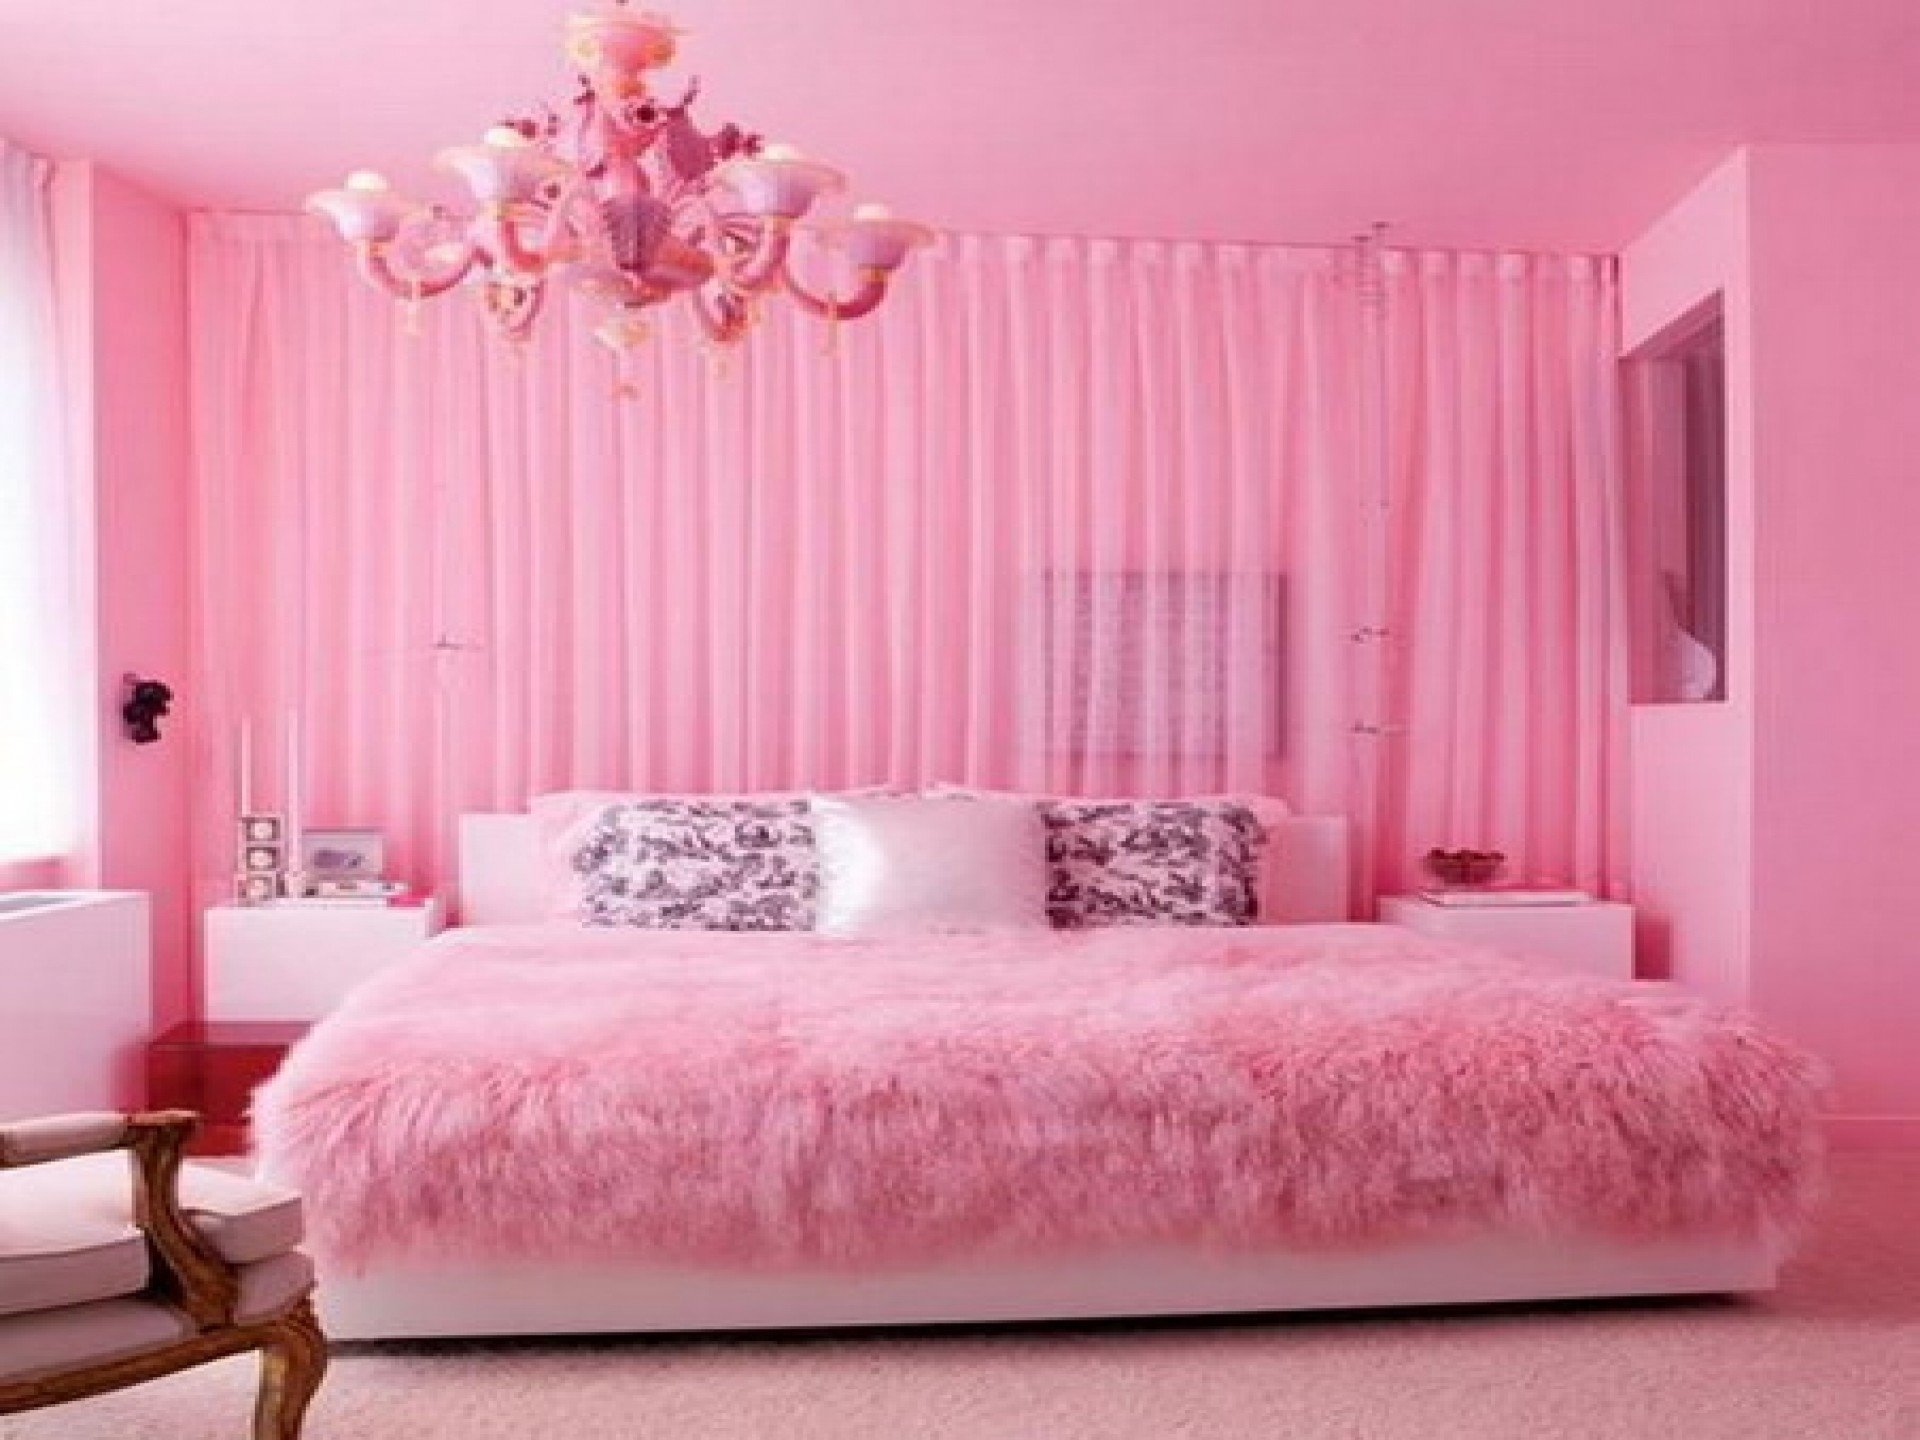 10 Pretty 10 Year Old Bedroom Ideas 10 year old bedroom ideas e280a2 bedroom ideas 2020